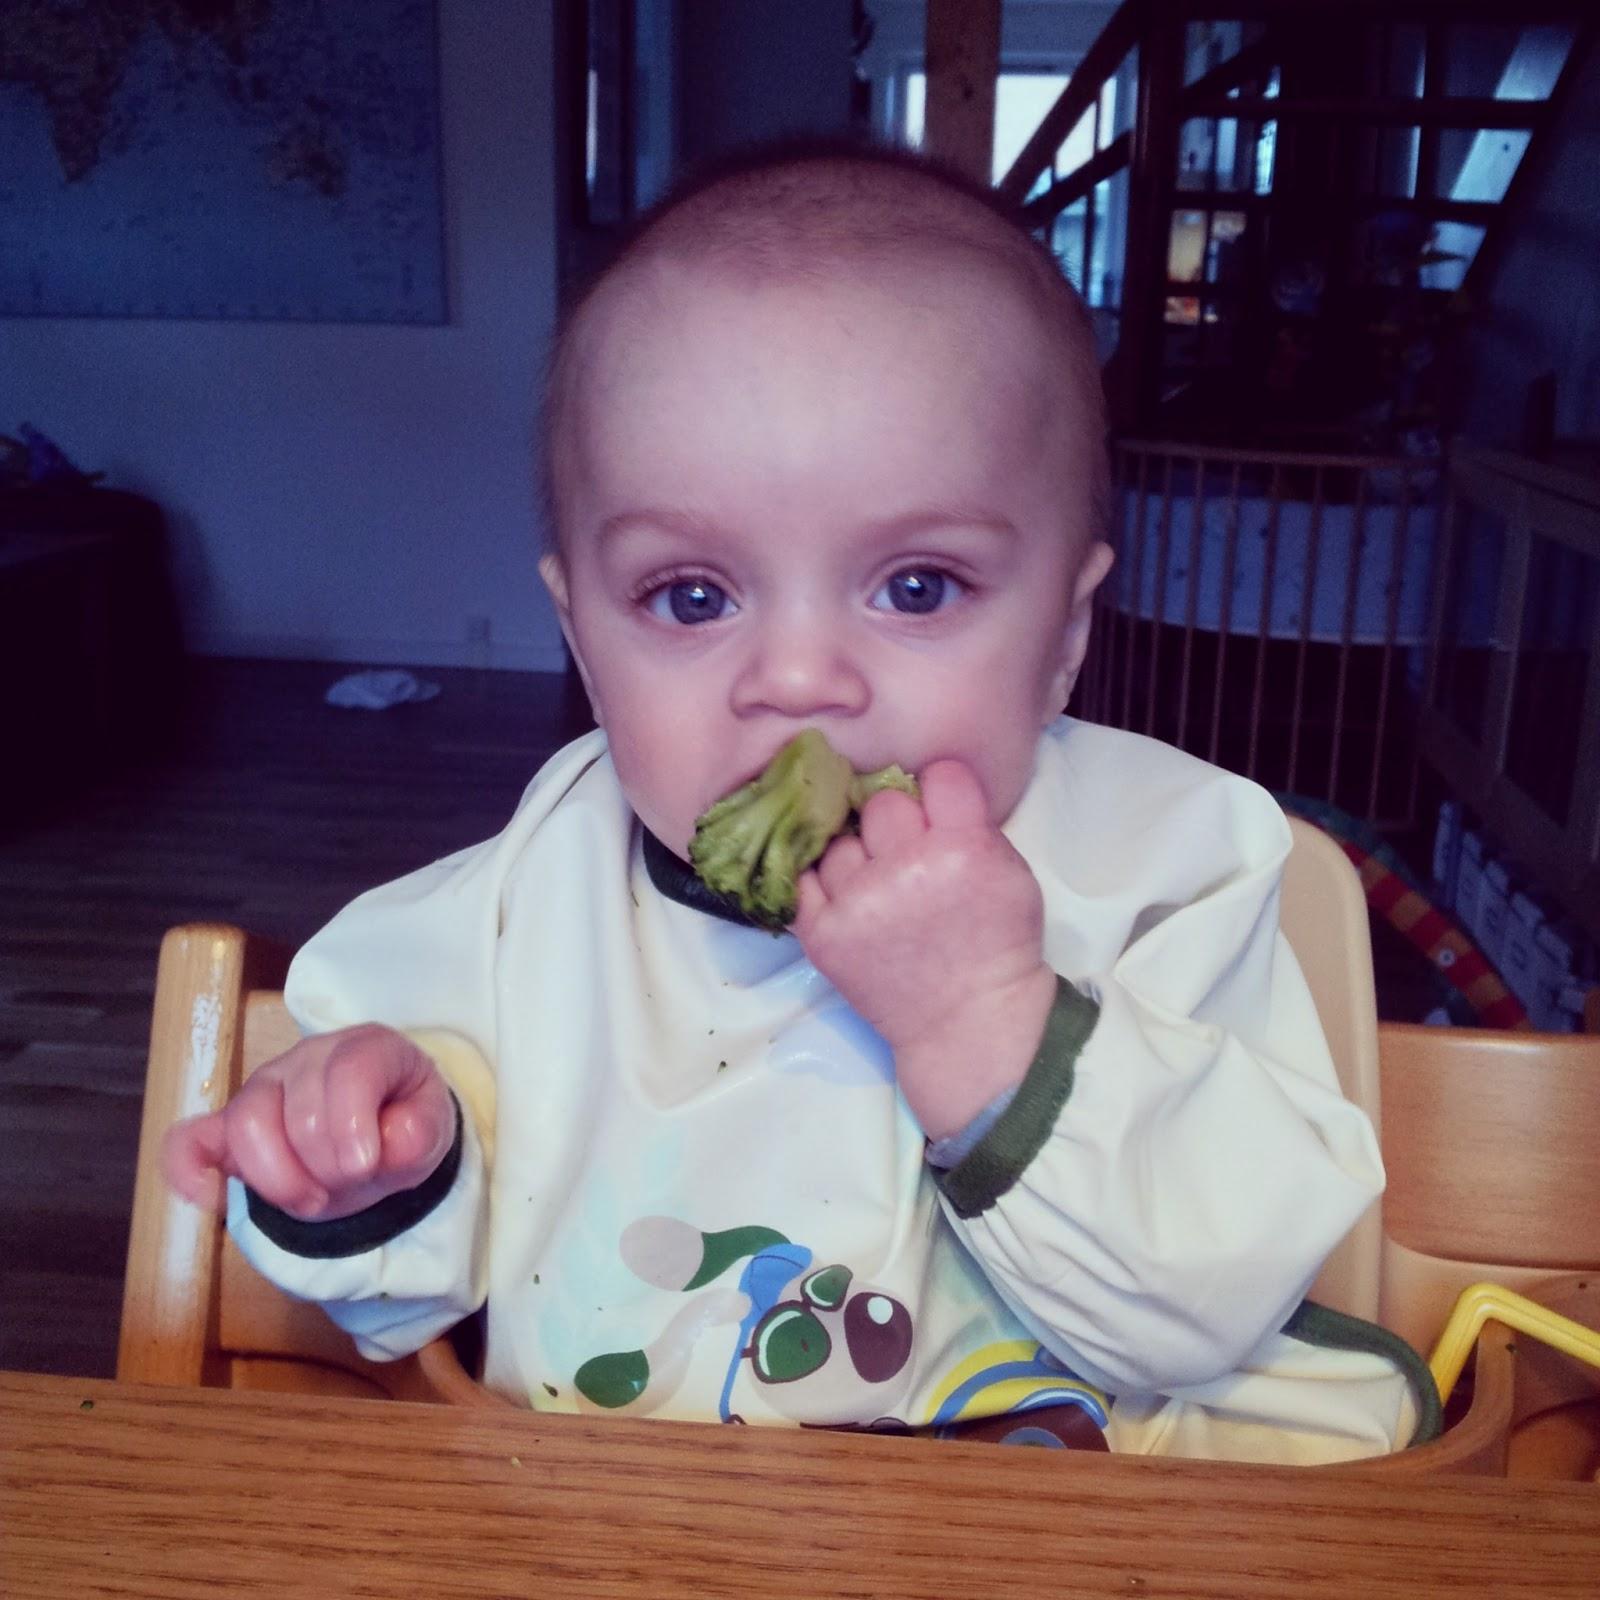 havregrød baby